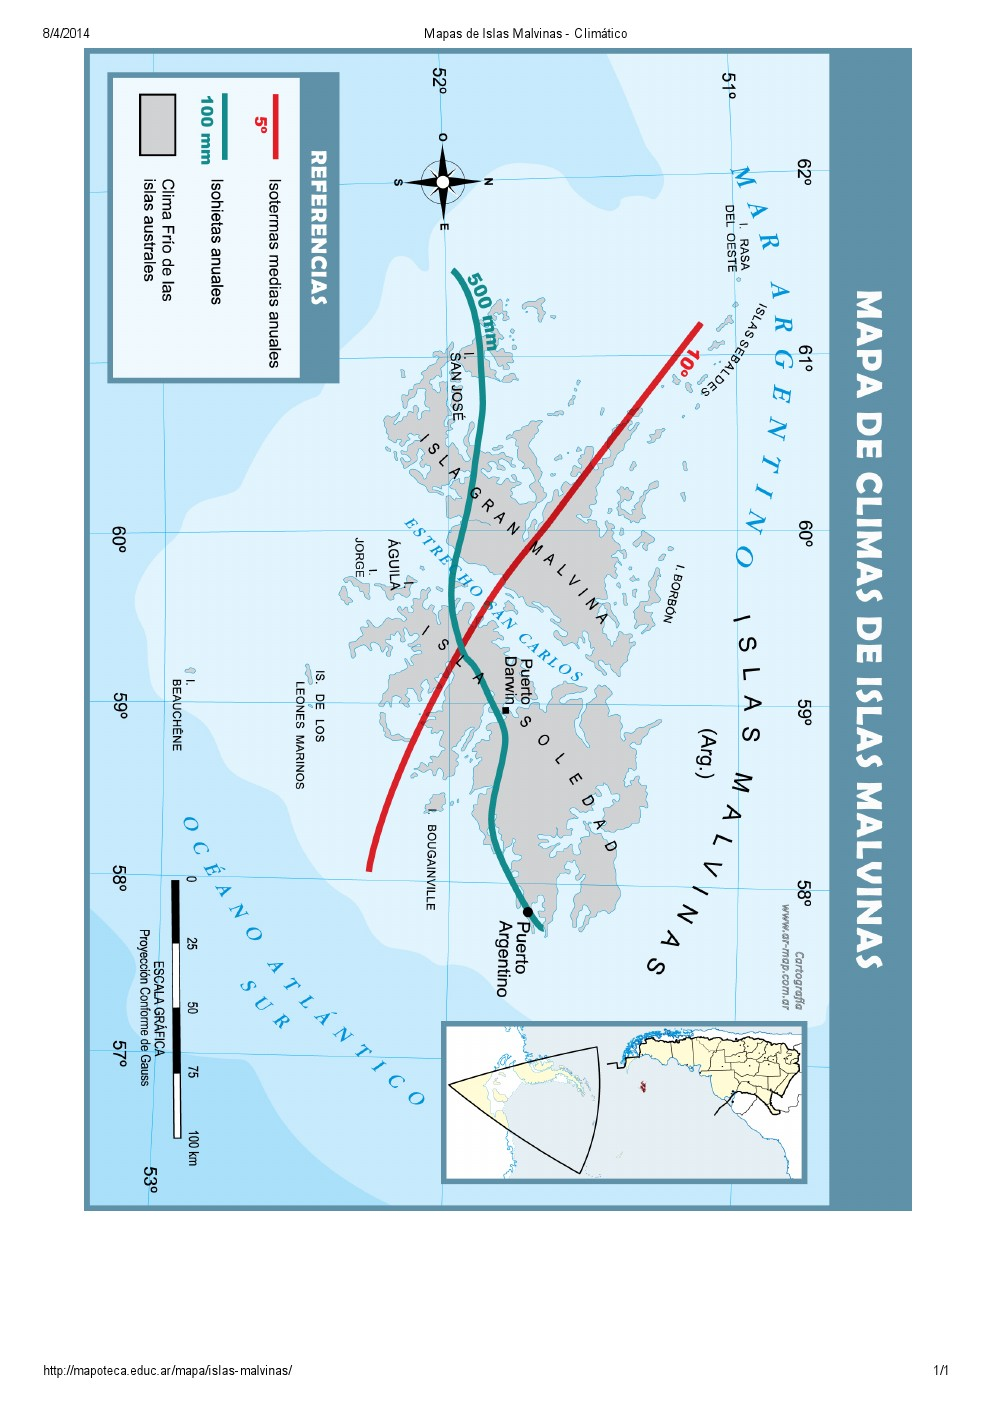 Mapa climático de las Islas Malvinas. Mapoteca de Educ.ar